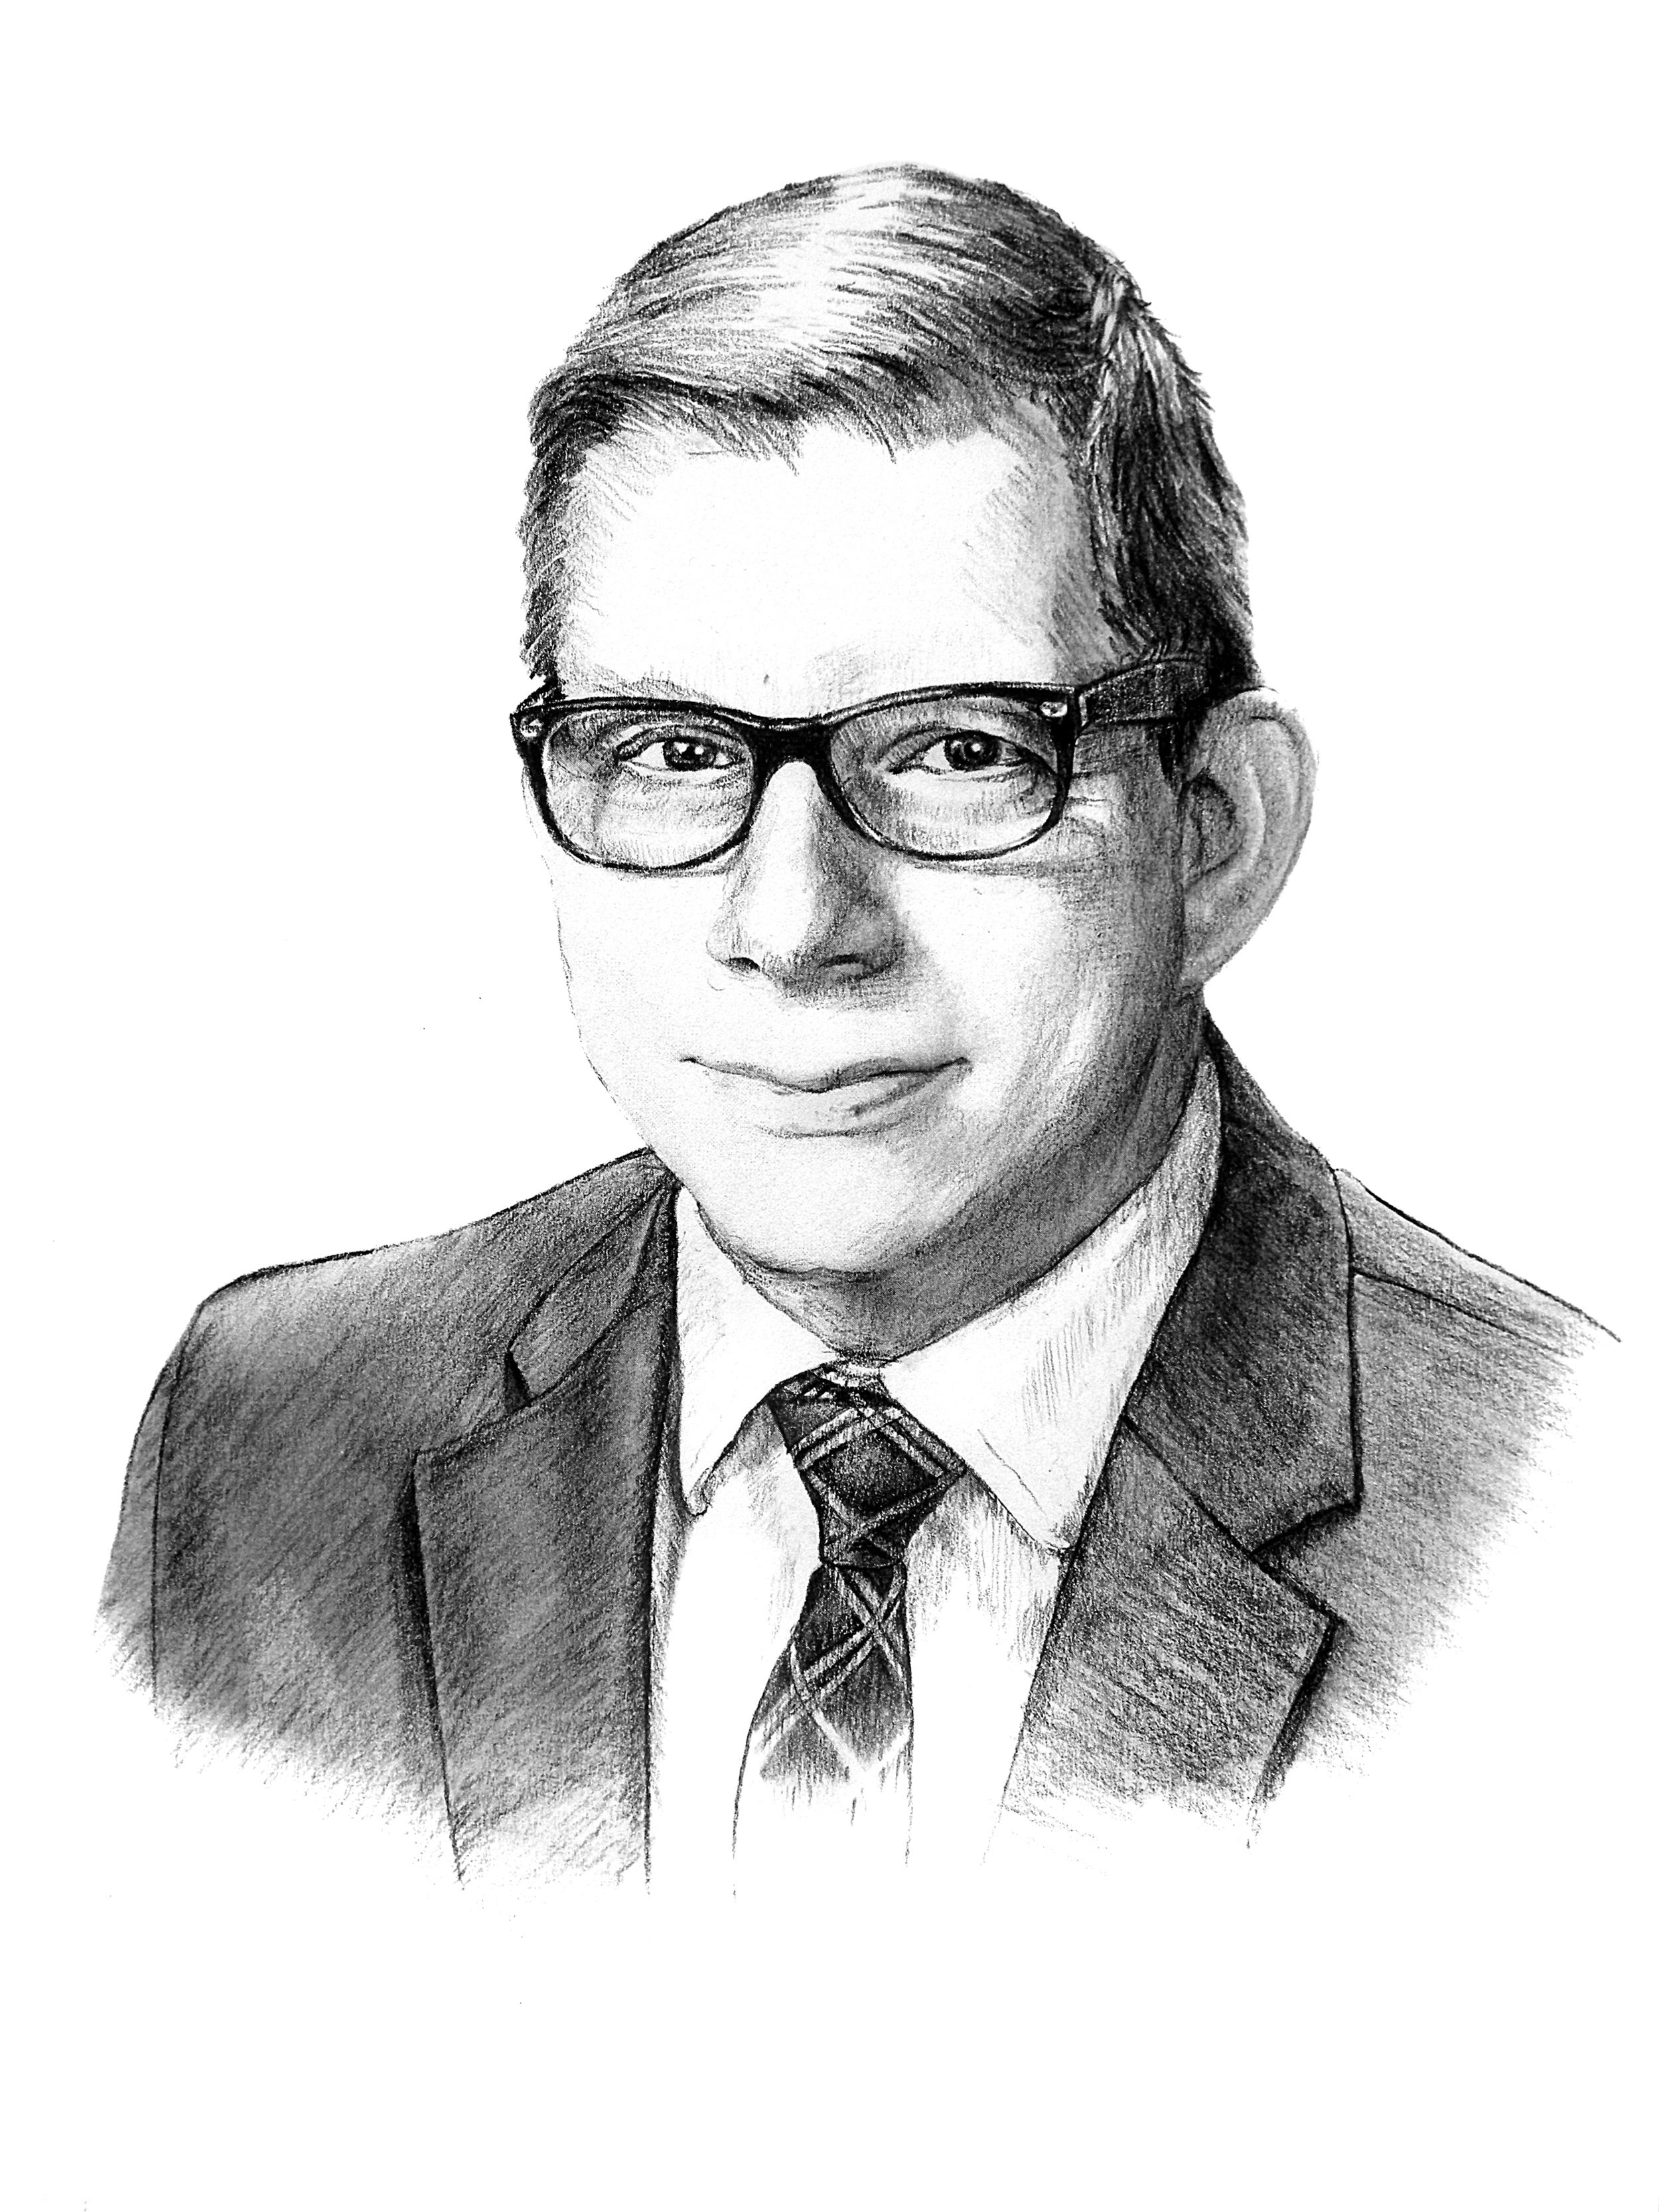 Ryan J. Stover, Associate